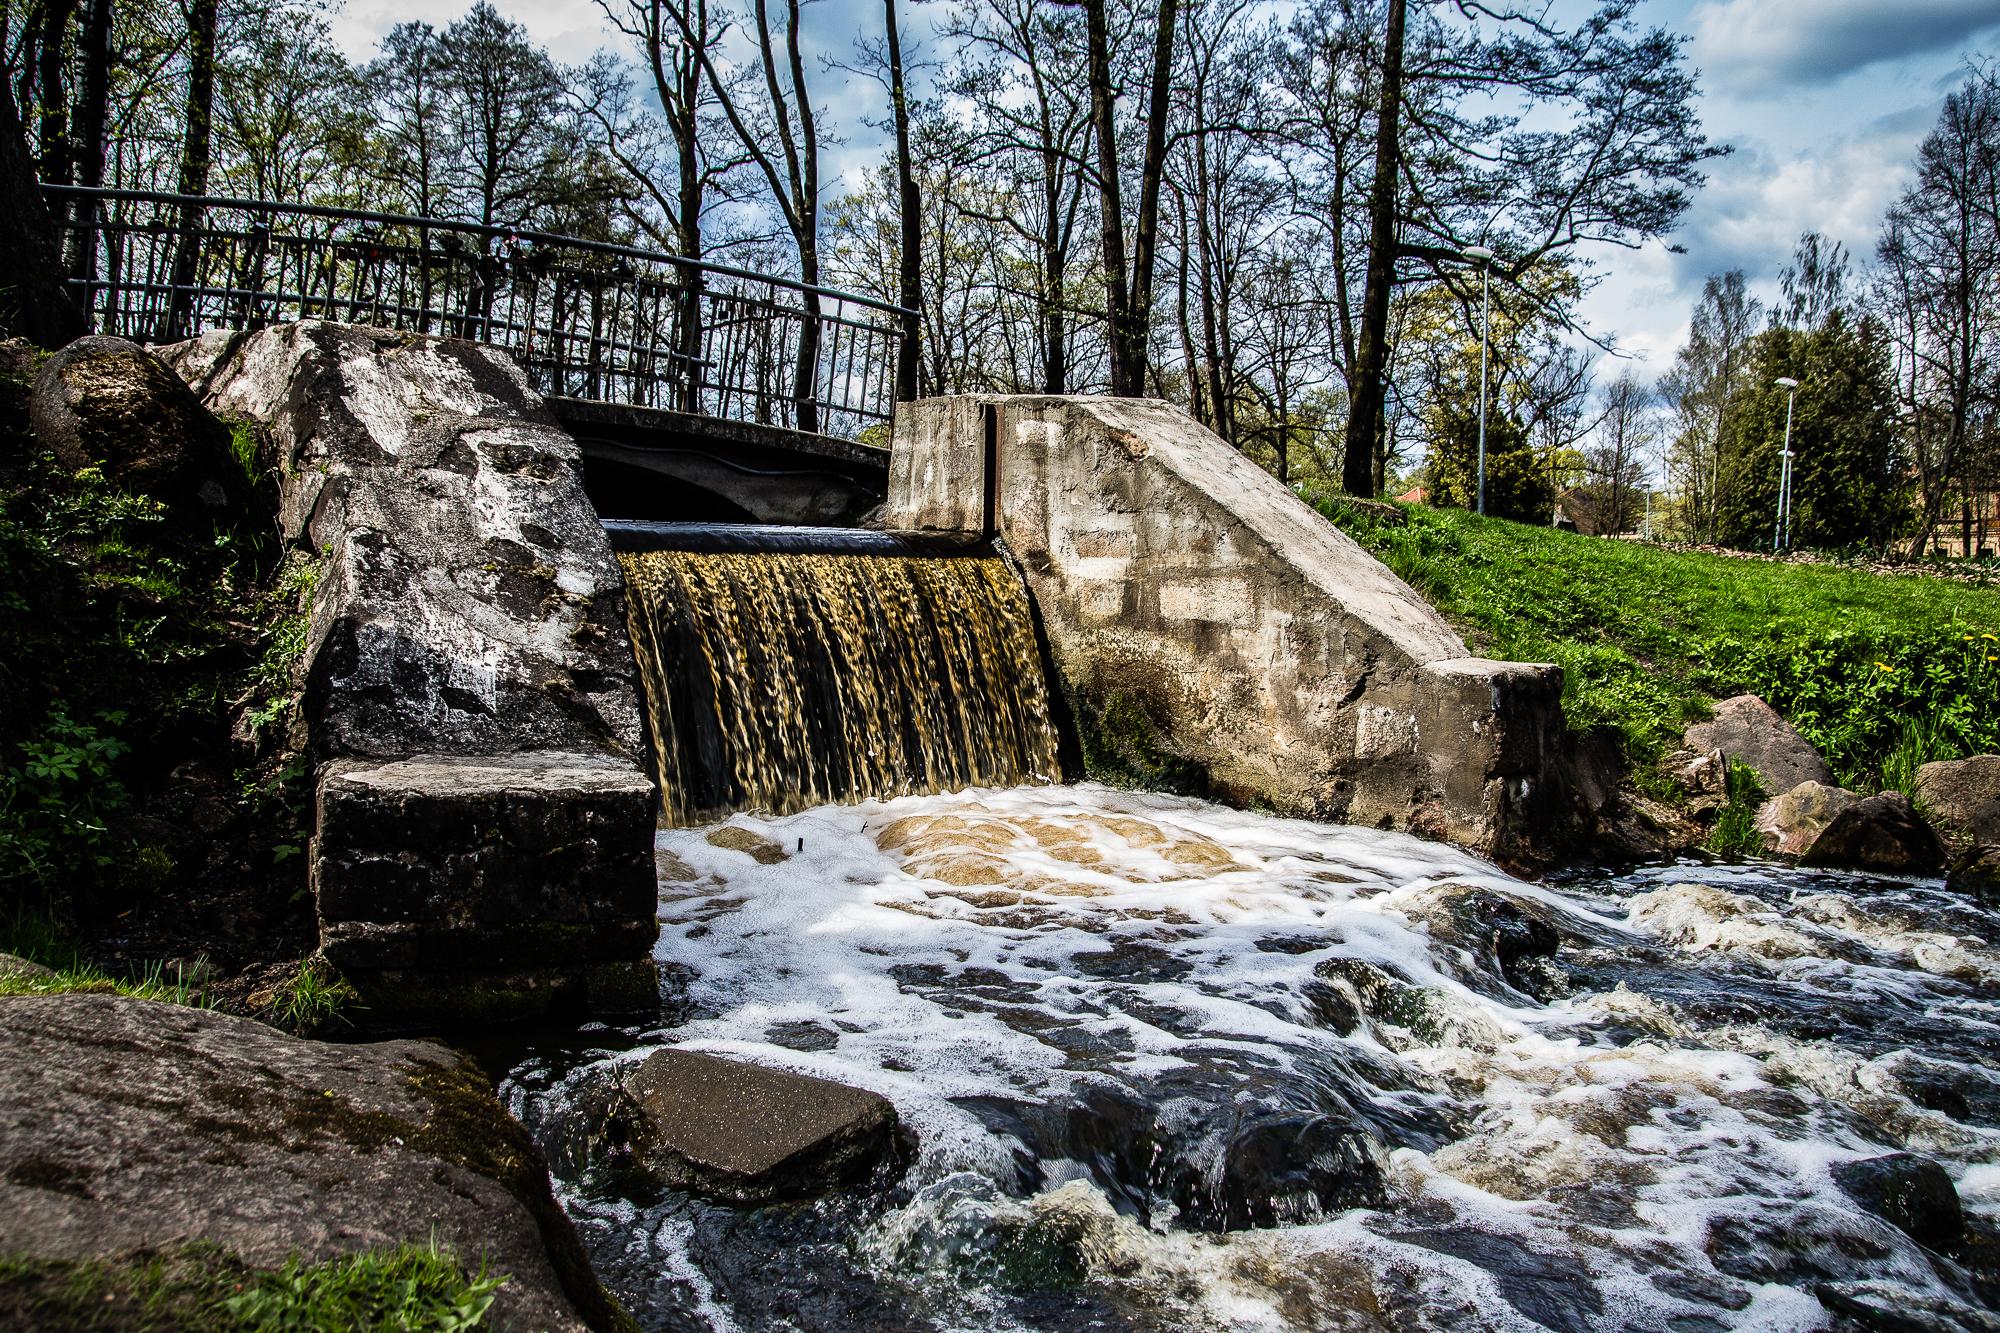 Waterfall Under The Bridge Via @Atisgailis